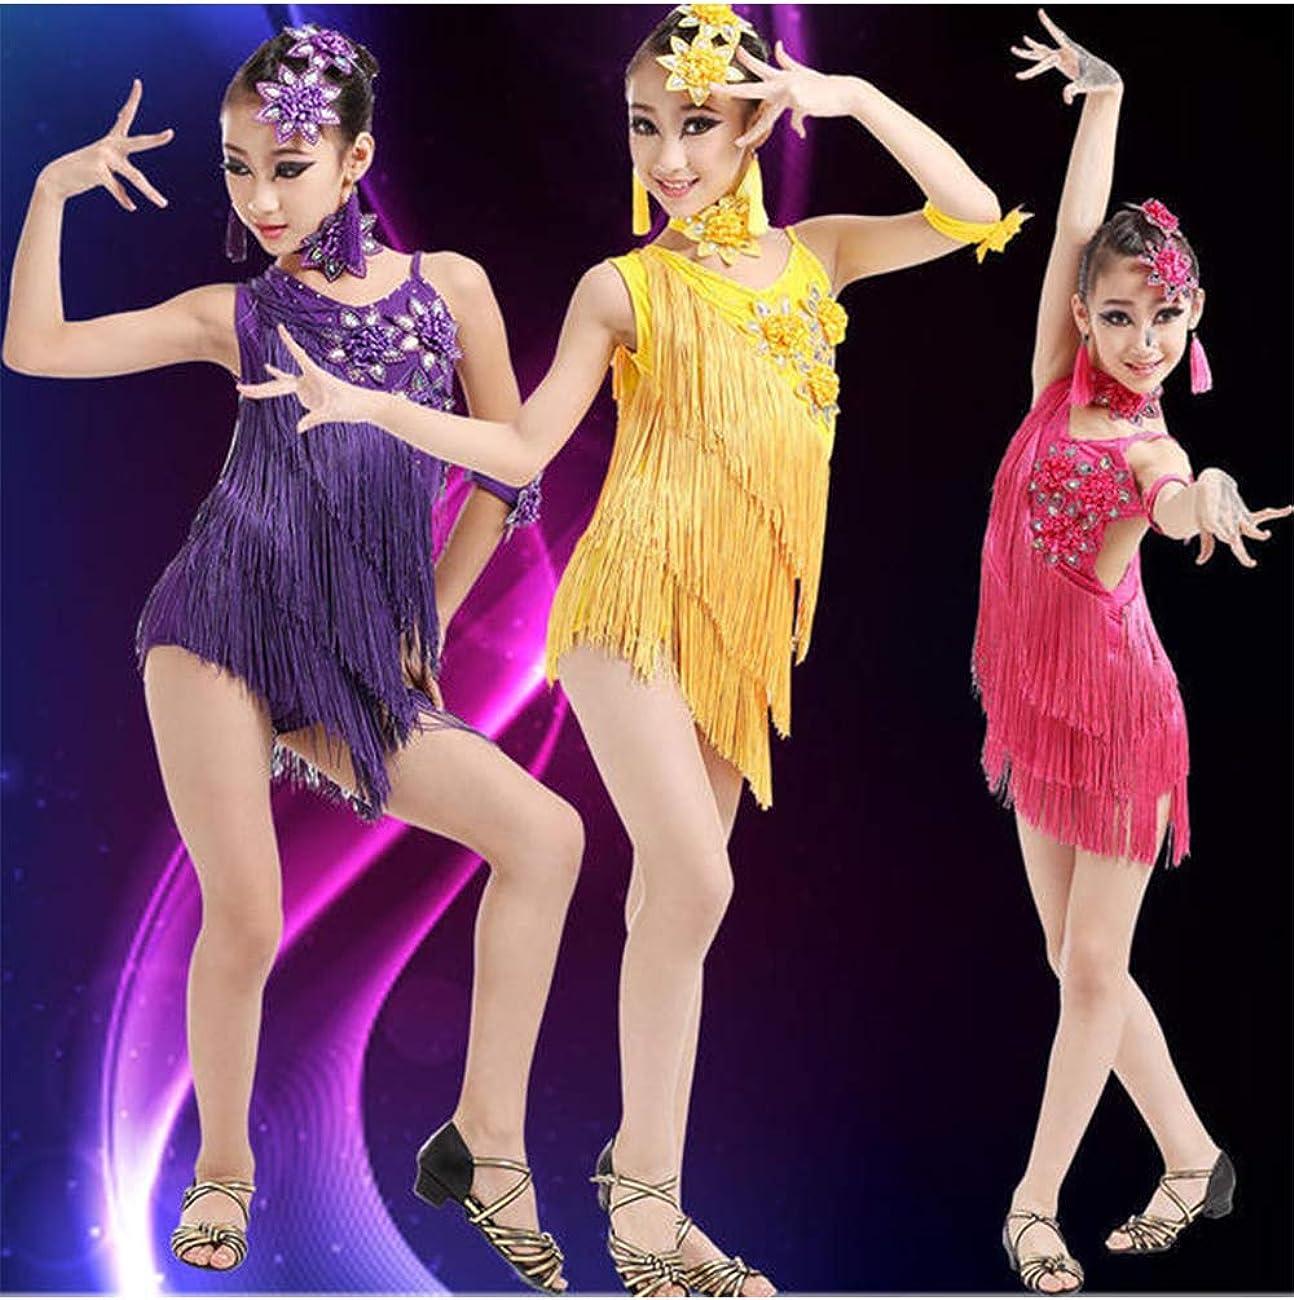 besbomig Kids Girls Sequin Fringe Salsa Tango Latin Dance Dress Party Performance Dancewear Ballroom Dancer Costume Outfit